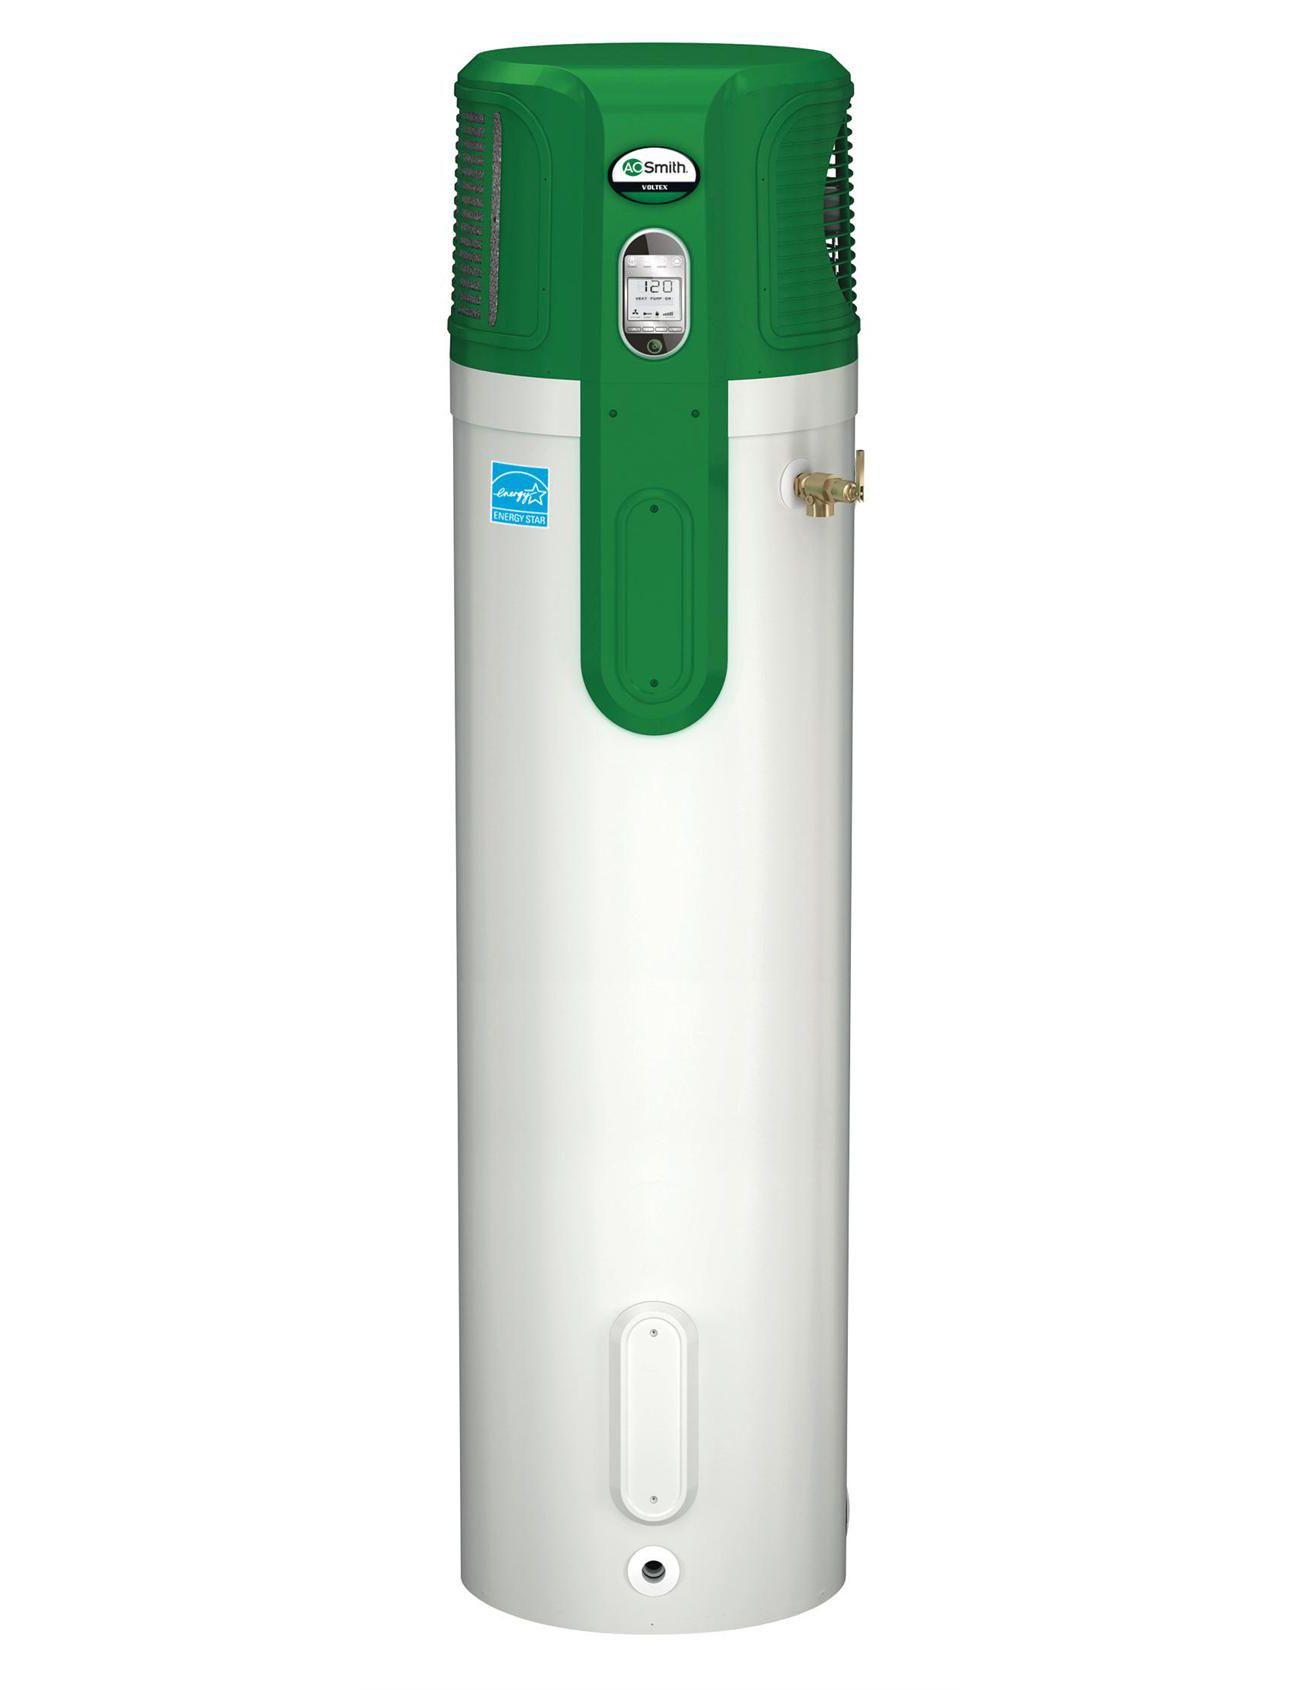 Heat Pump Water Heaters Come Of Age Heat Pump Water Heater Water Heater Heat Pump